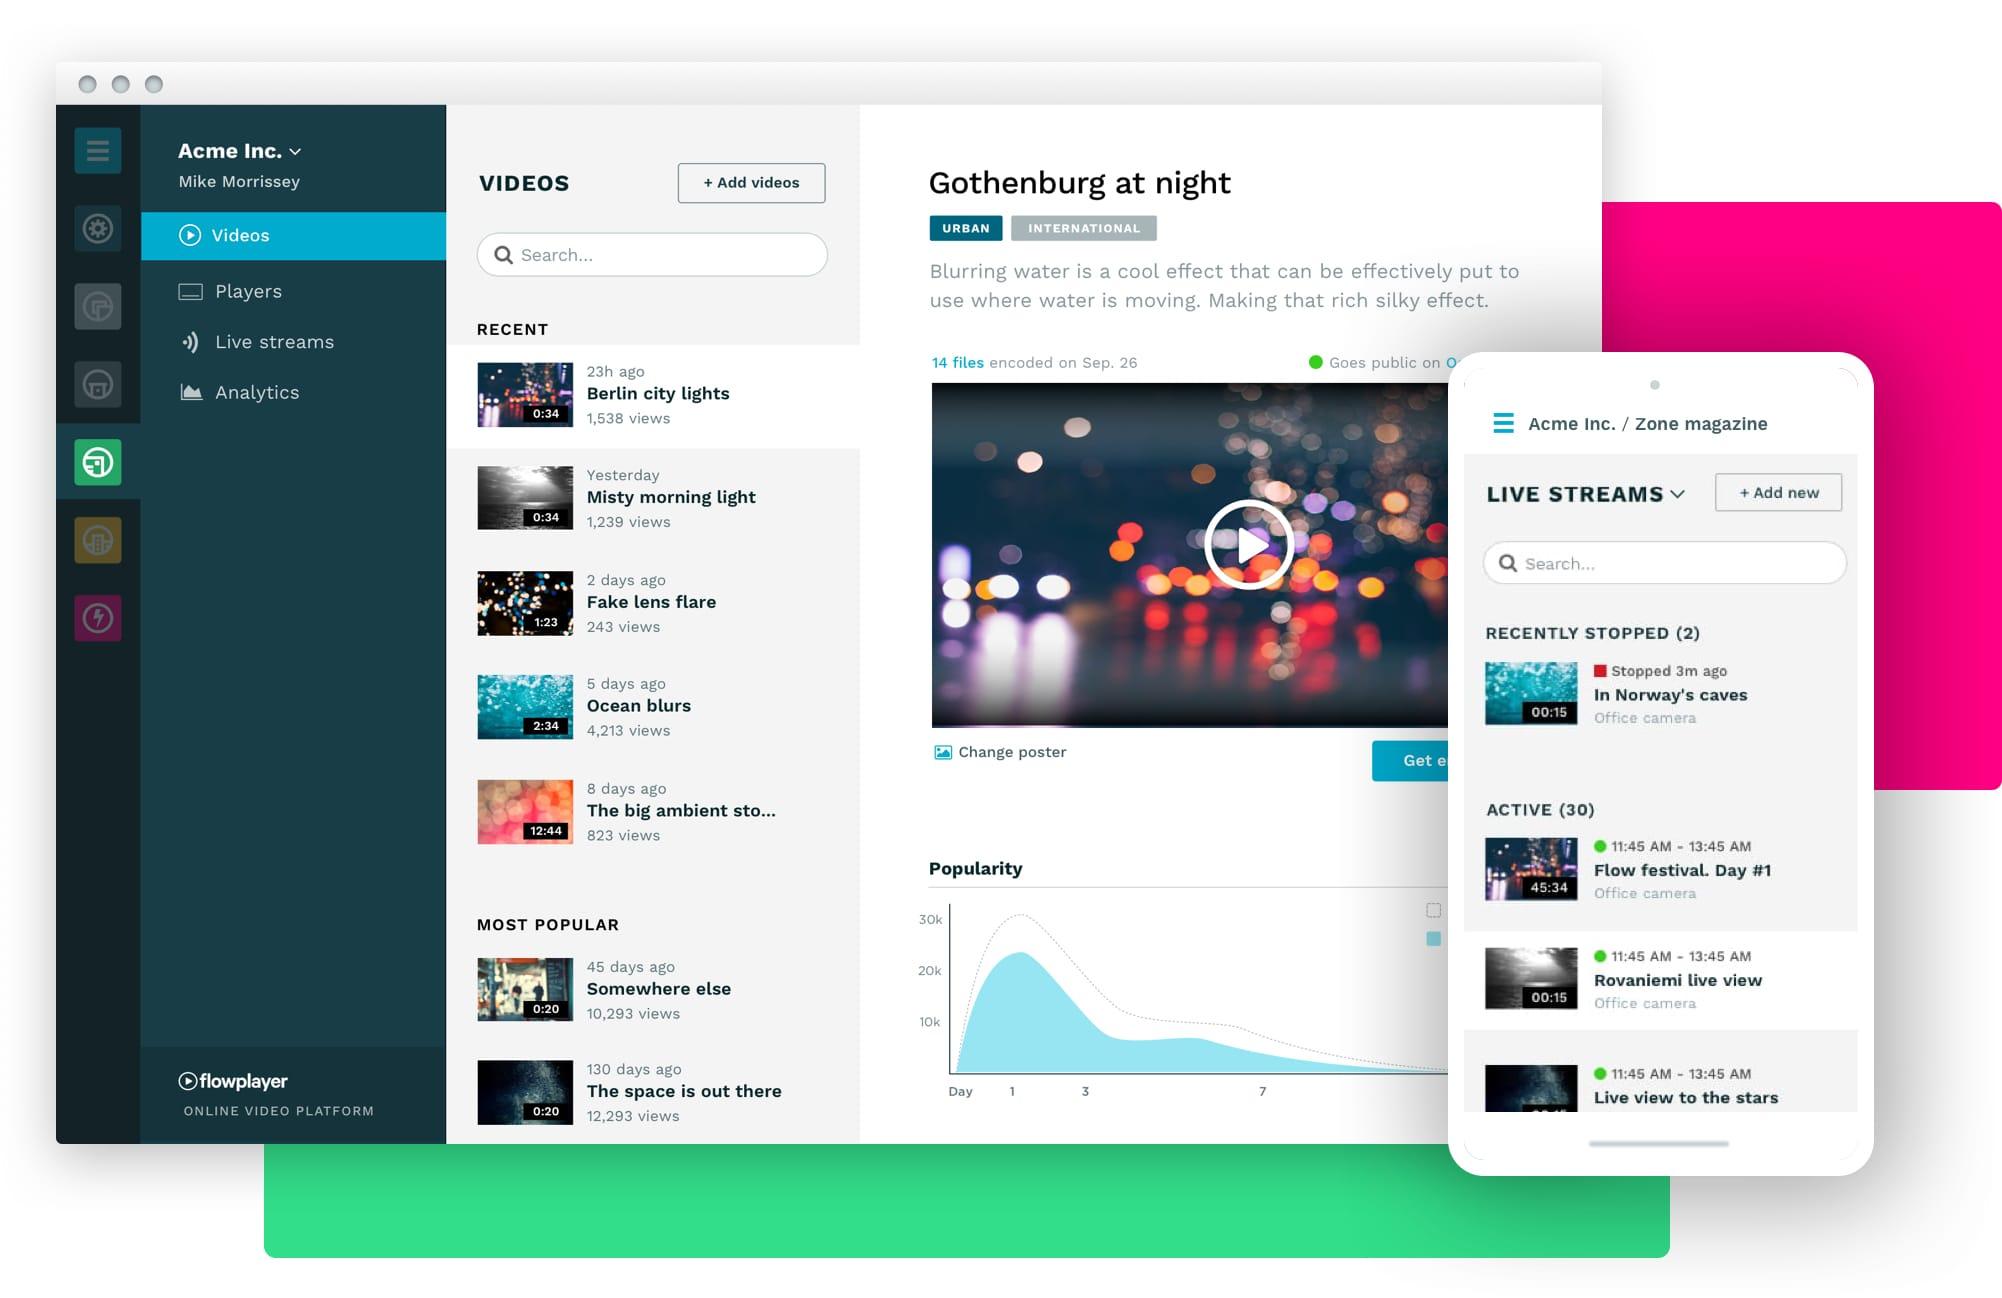 flowplayer Demo - The Flowplayer platform